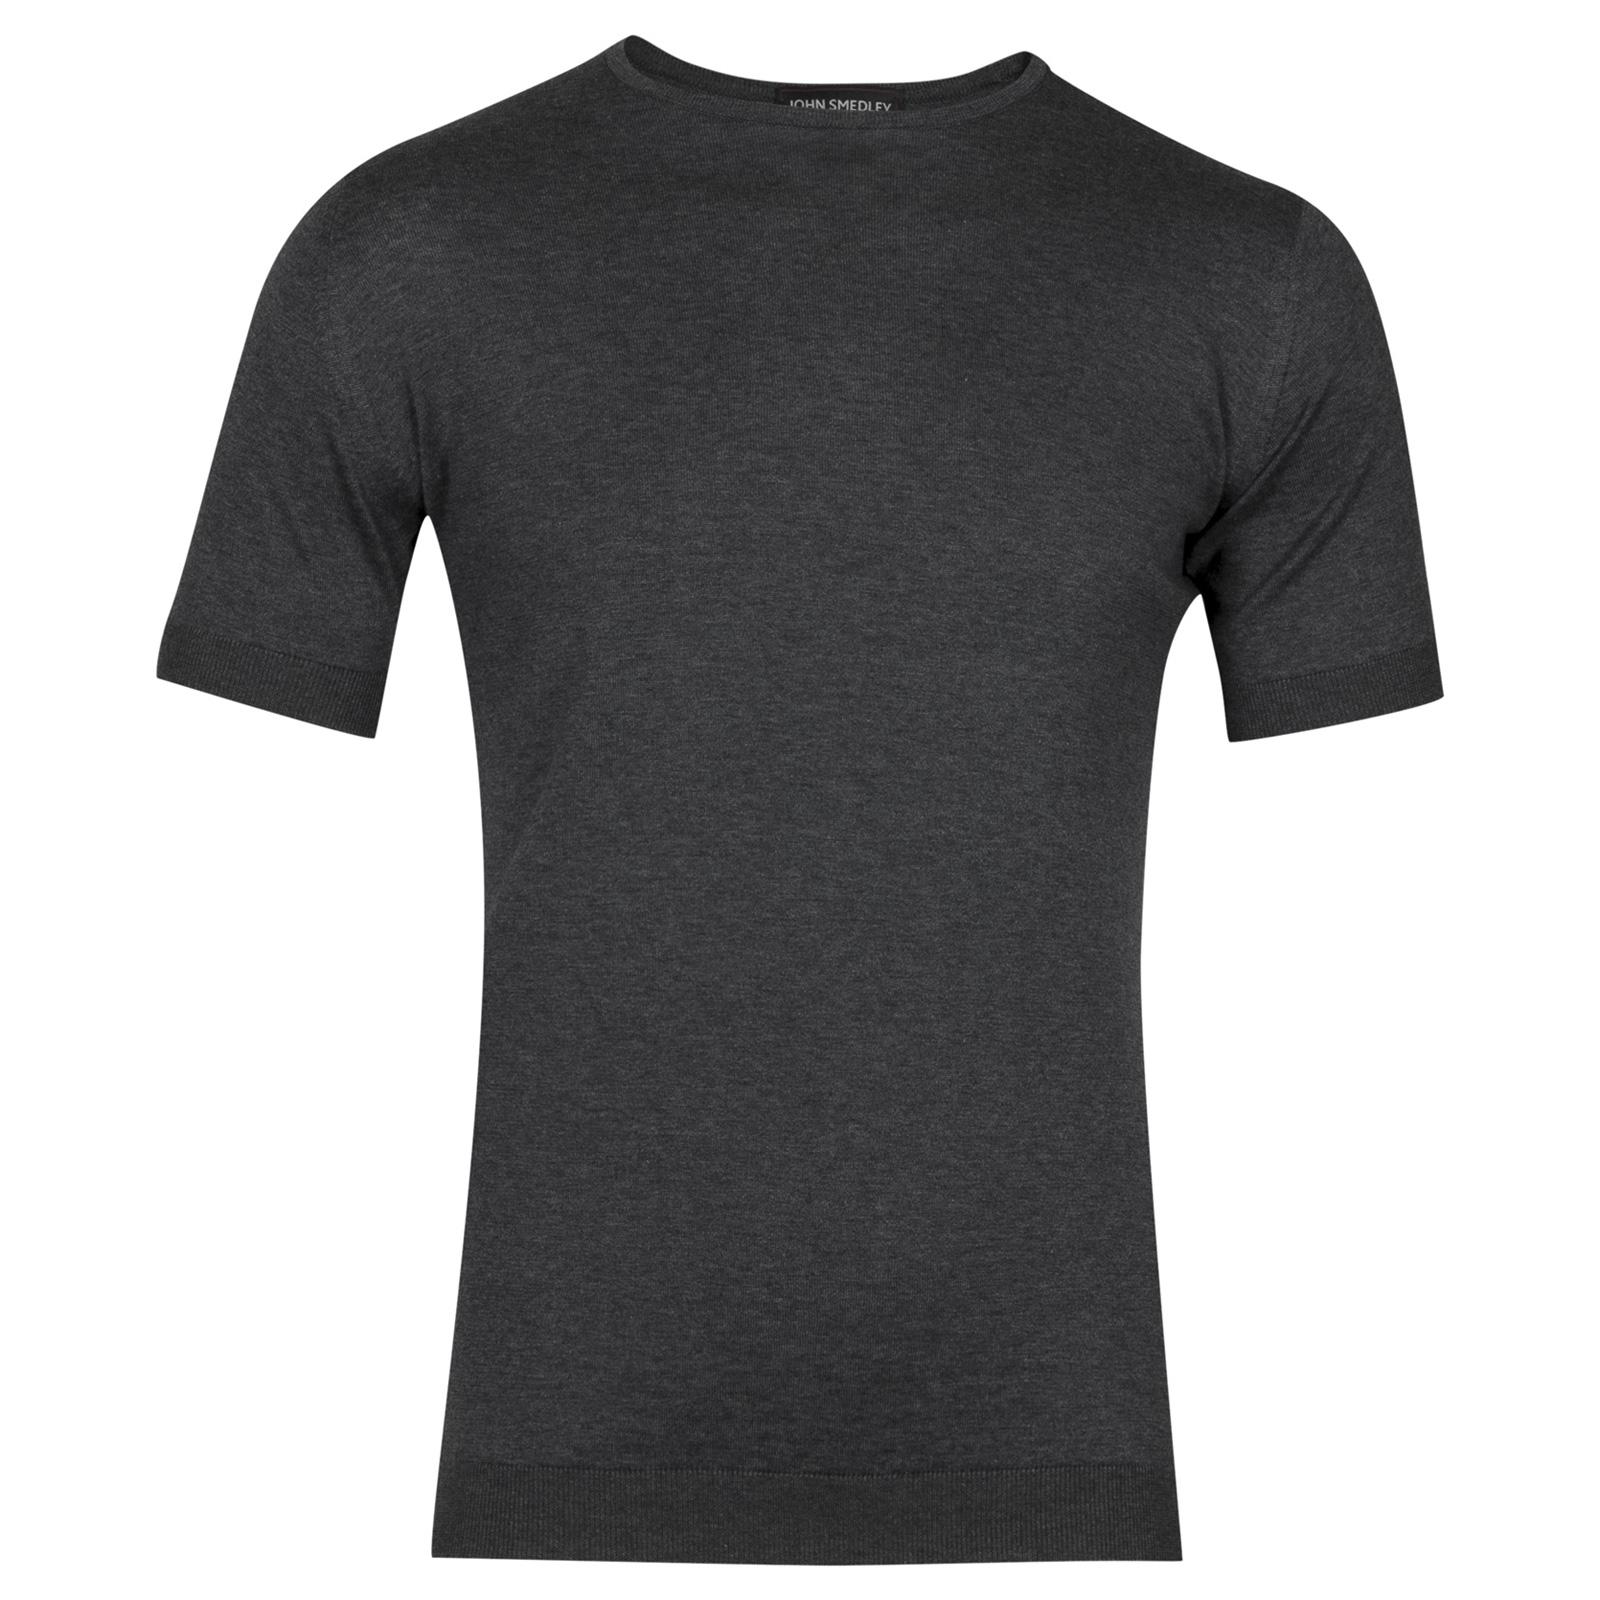 John Smedley belden Sea Island Cotton T-shirt in Charcoal-L